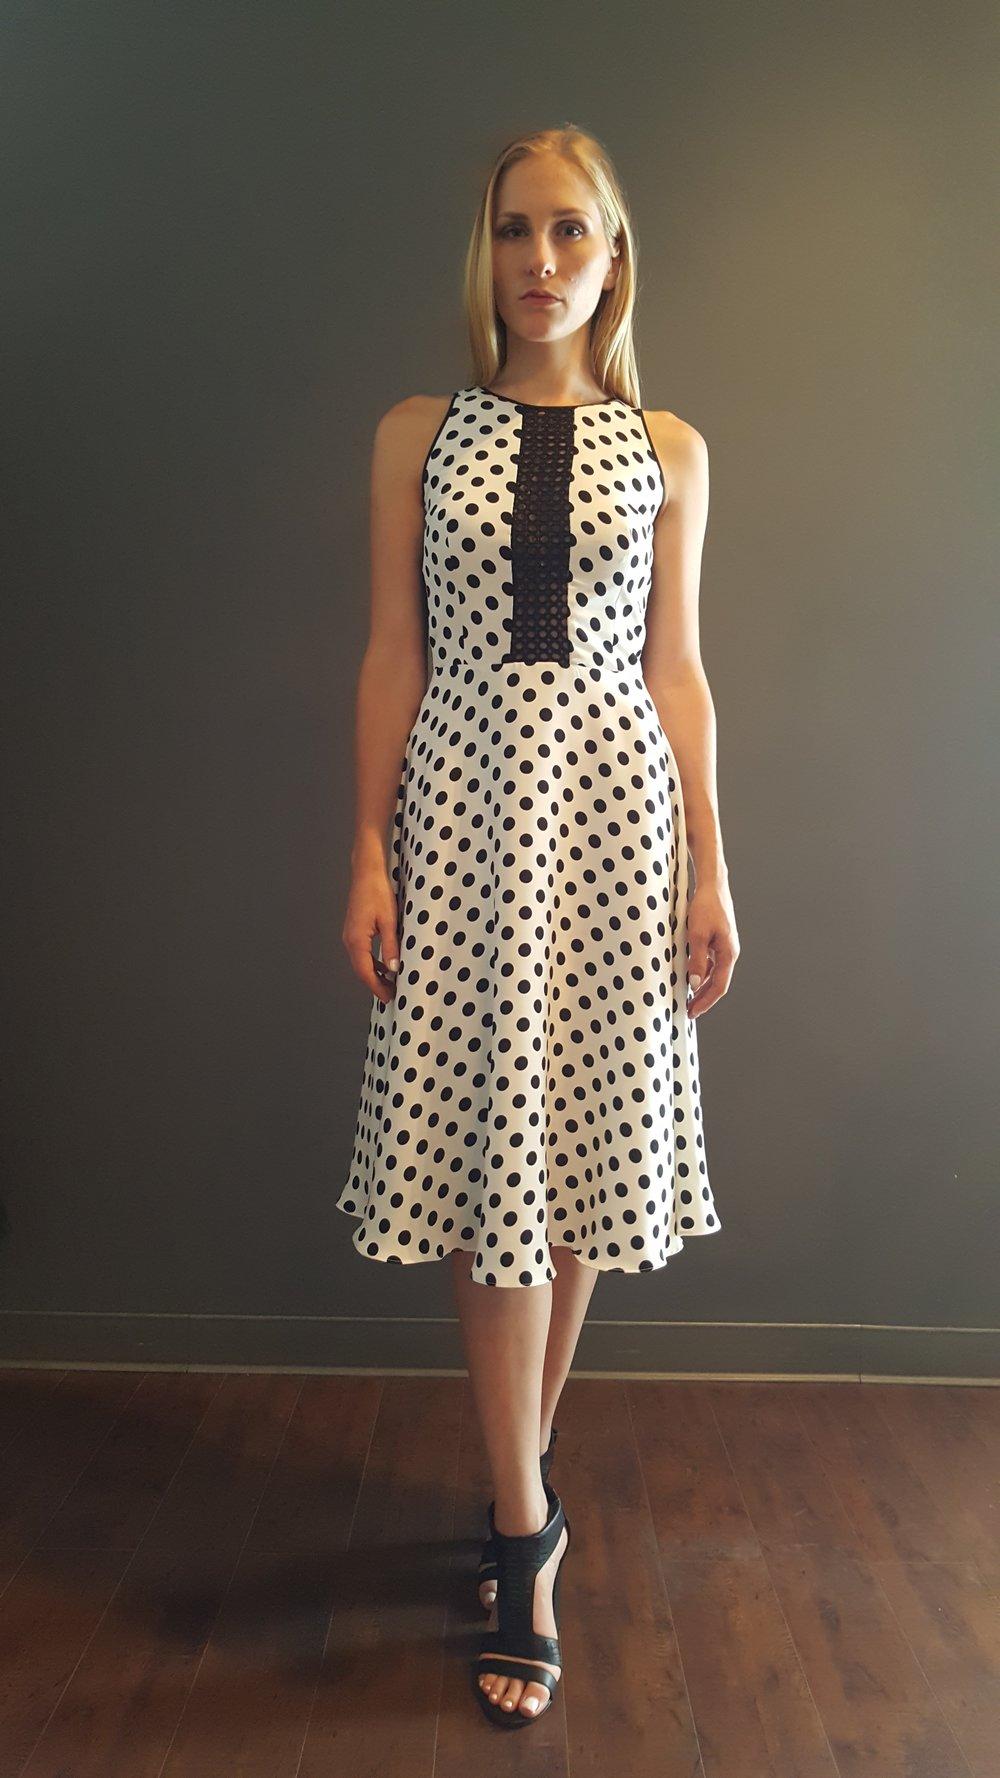 Polkadot Swing Dress